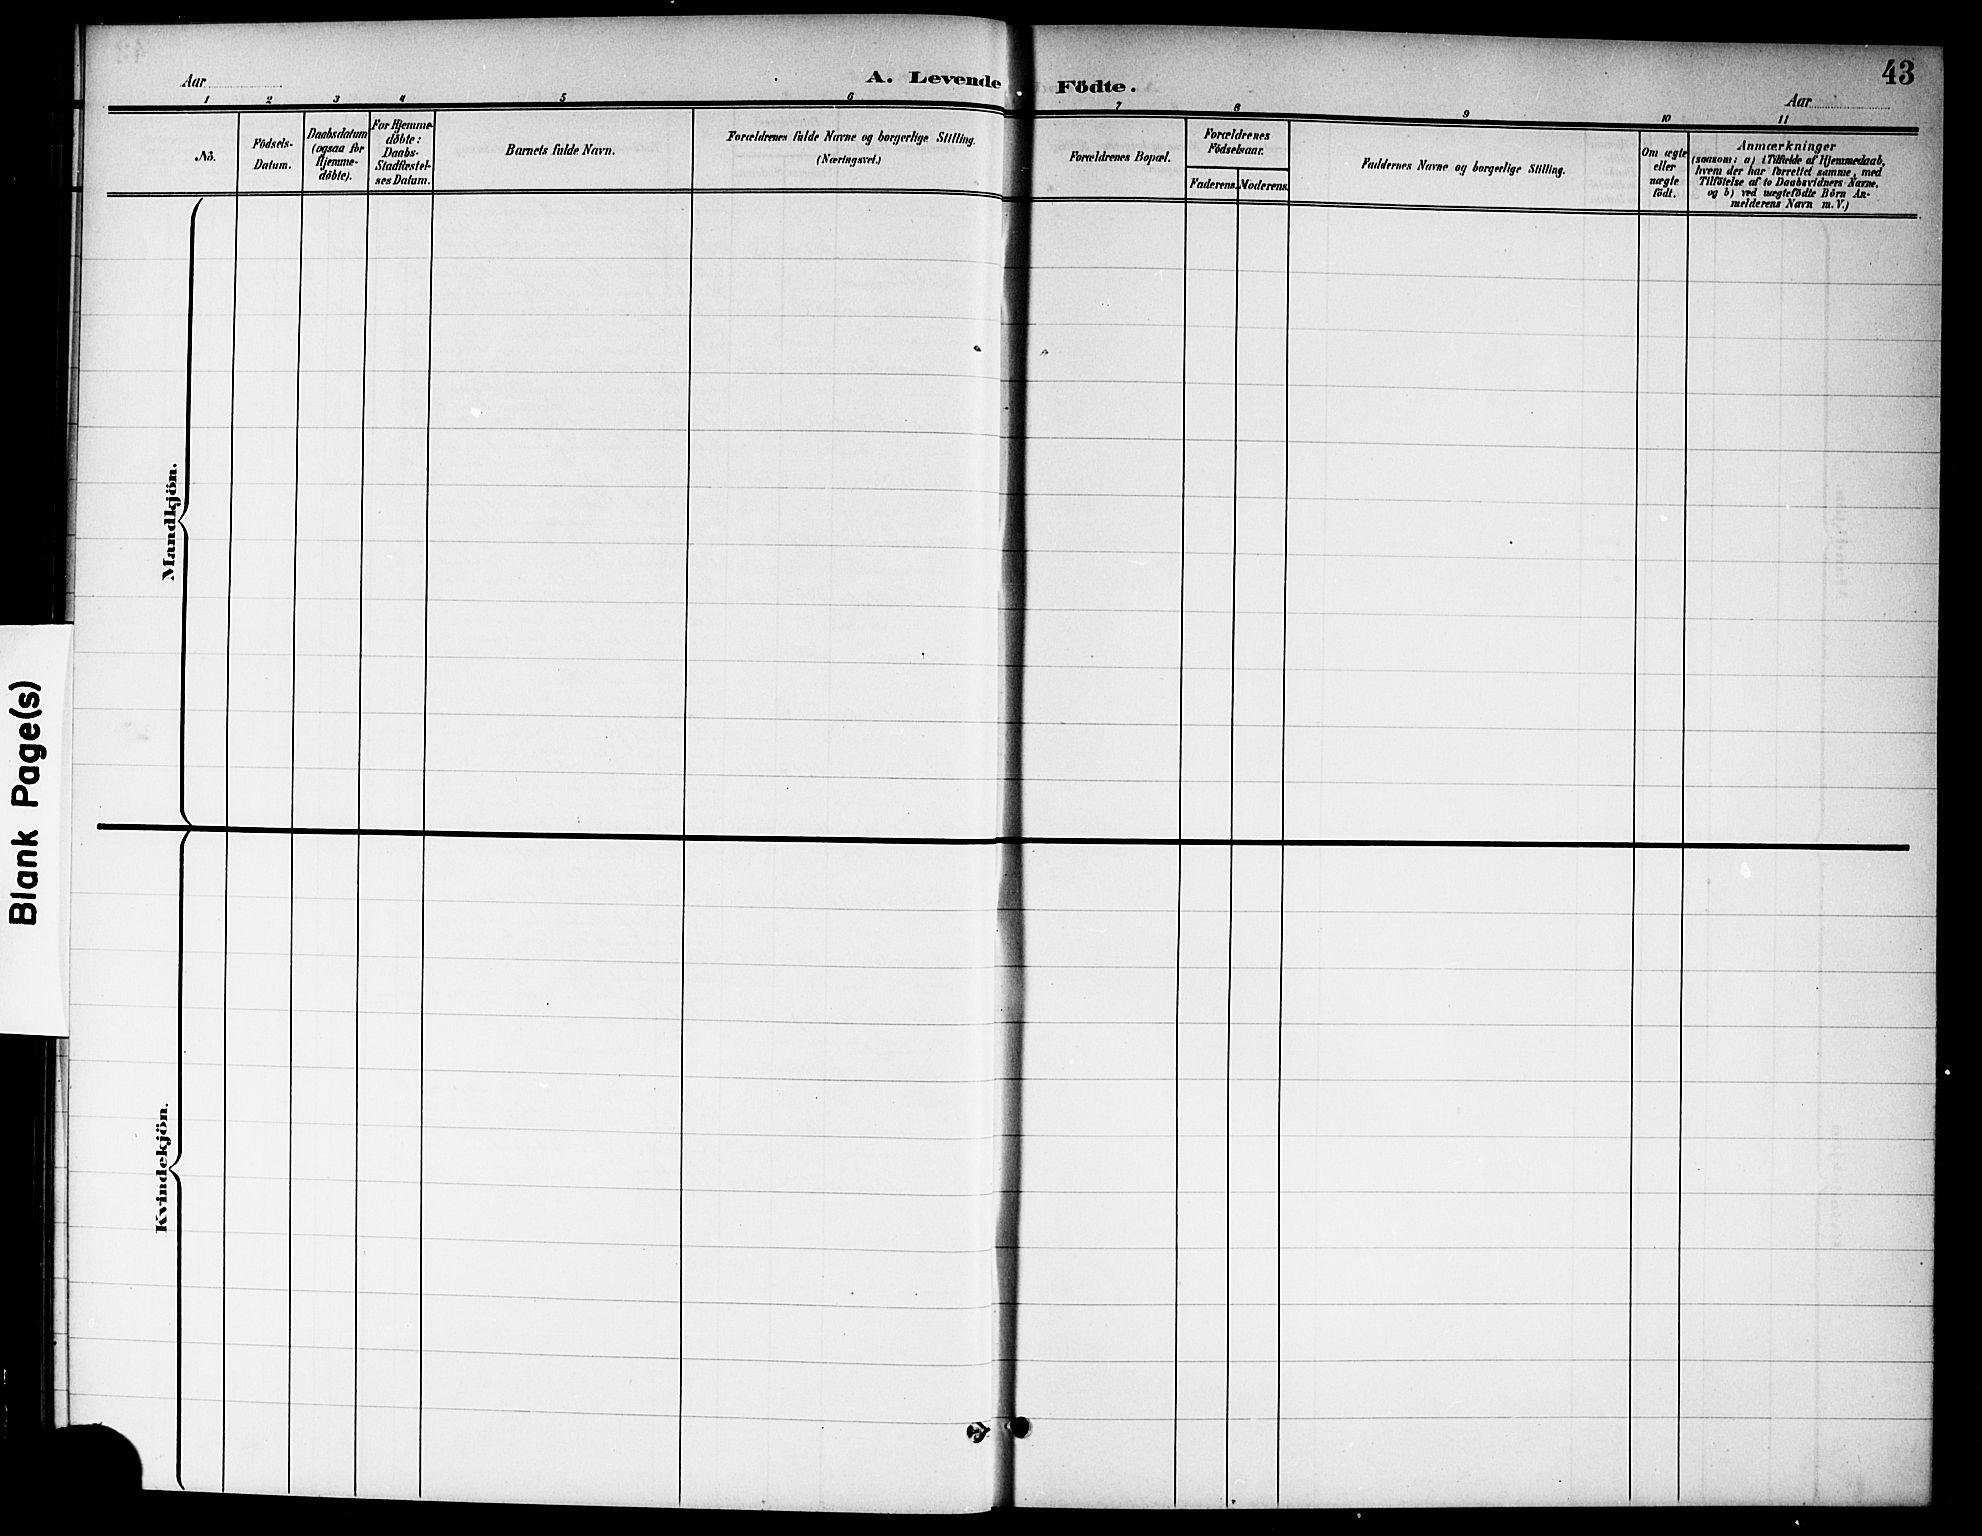 SAO, Nannestad prestekontor Kirkebøker, G/Ga/L0002: Klokkerbok nr. I 2, 1901-1913, s. 43